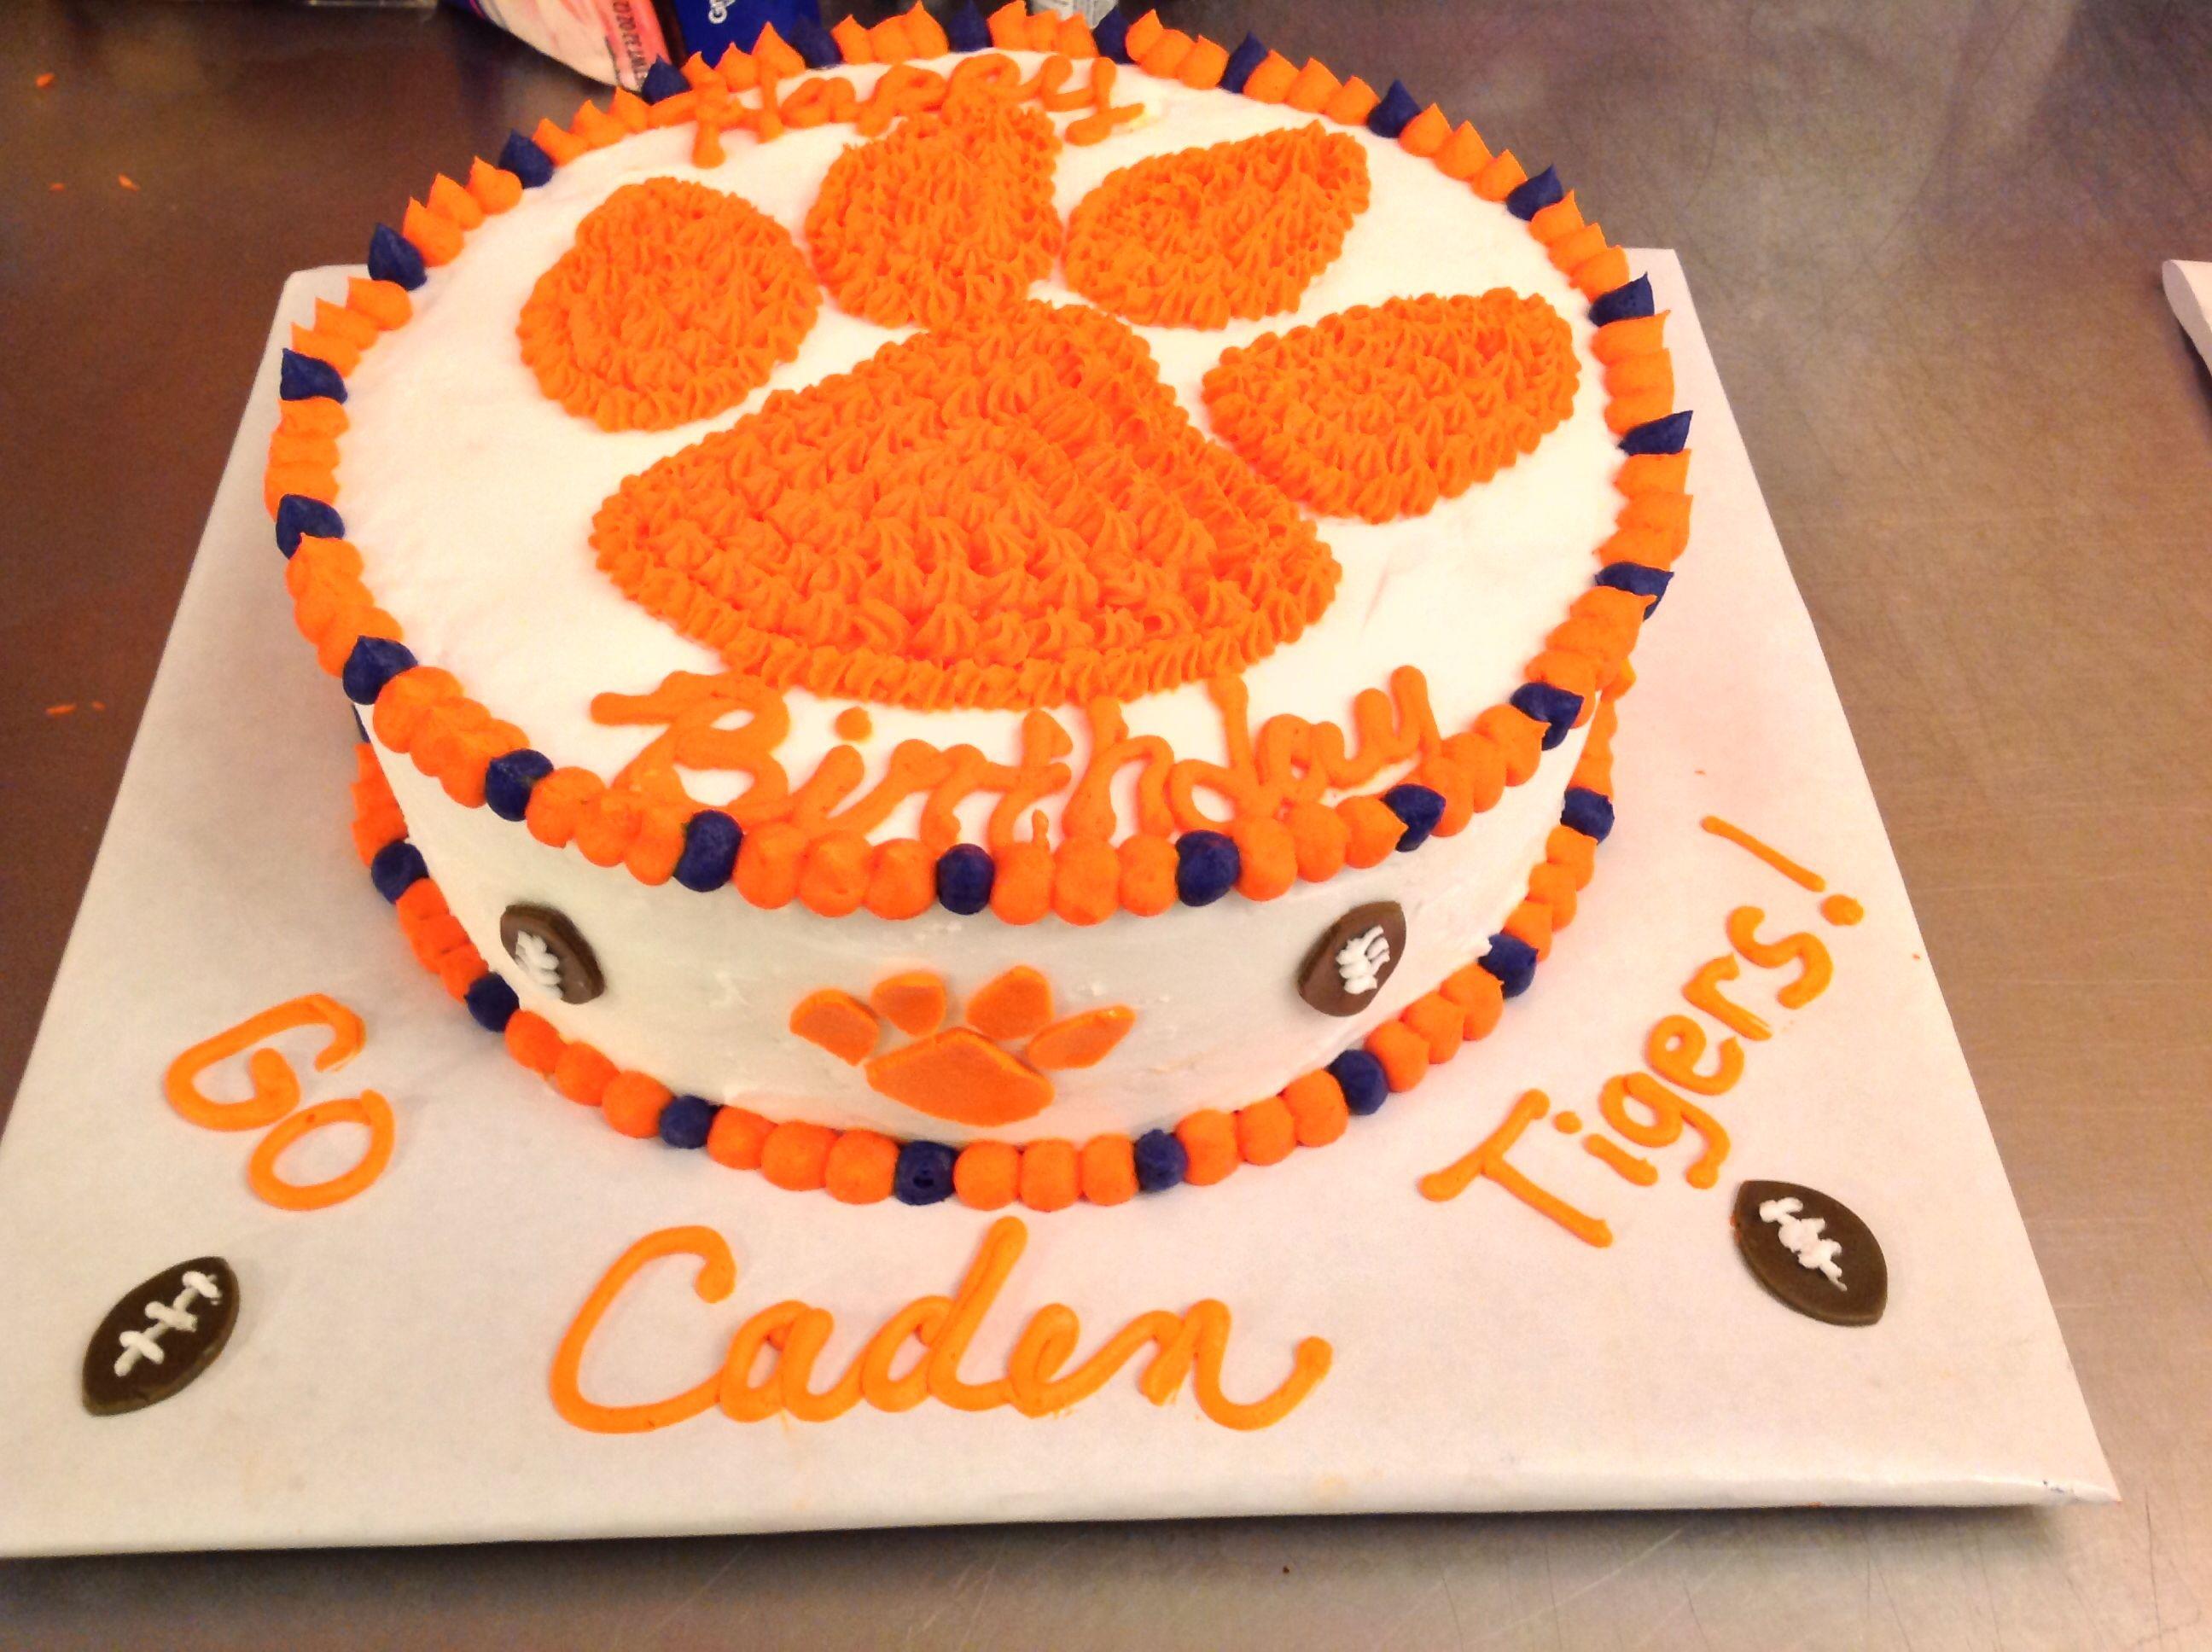 Clemson Tigers Birthday Cake My Cakes Pinterest Birthday Cakes